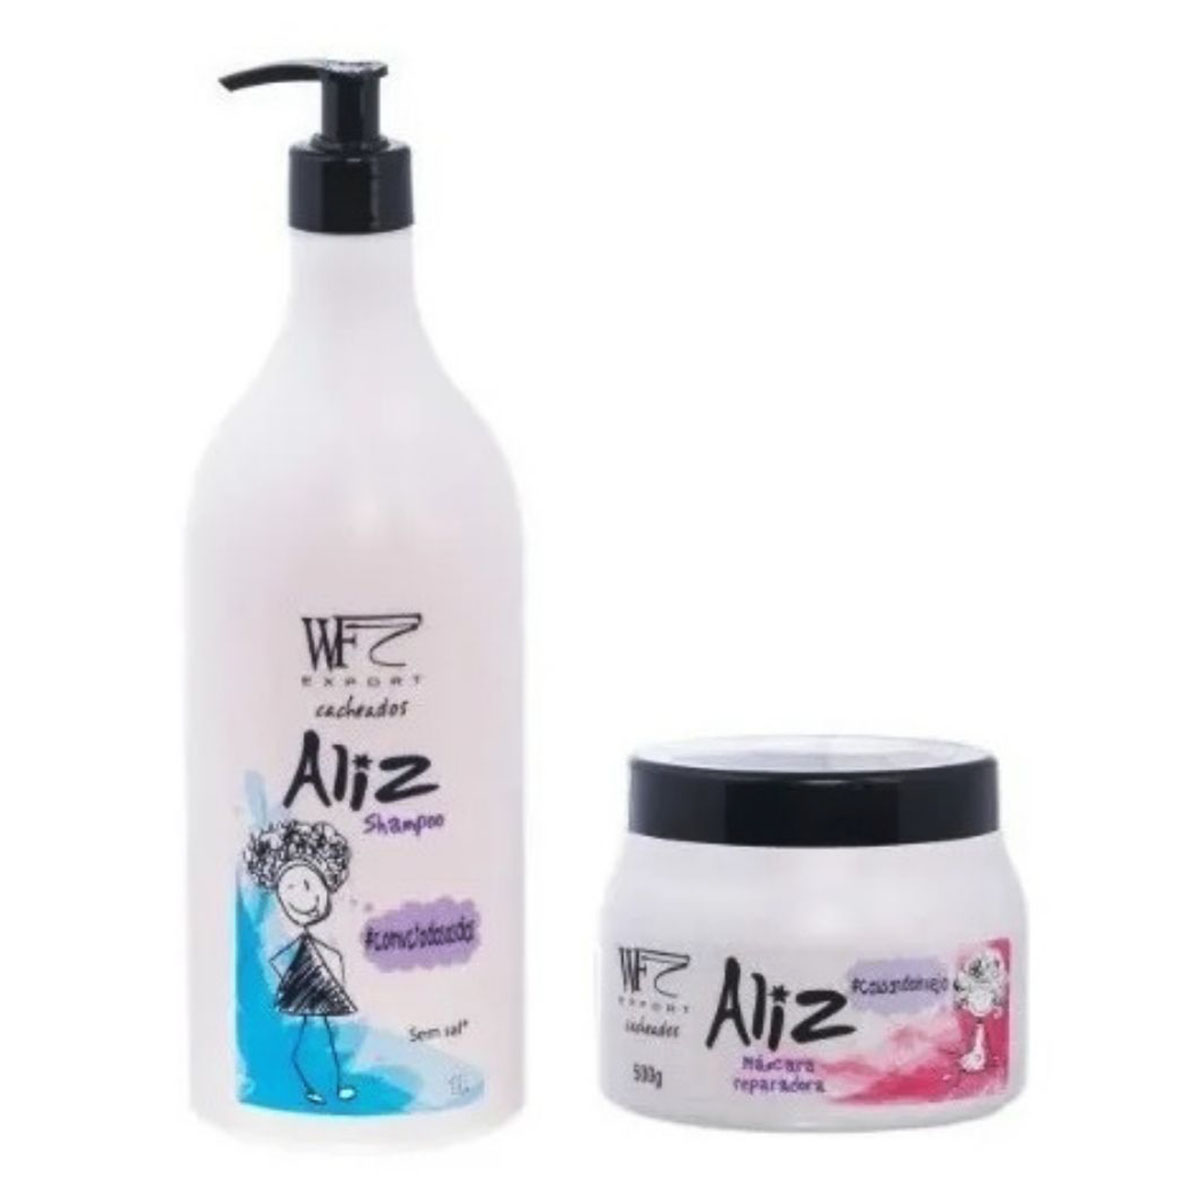 Kit Wf Cosméticos Aliz Duo Professional (2 Produtos)